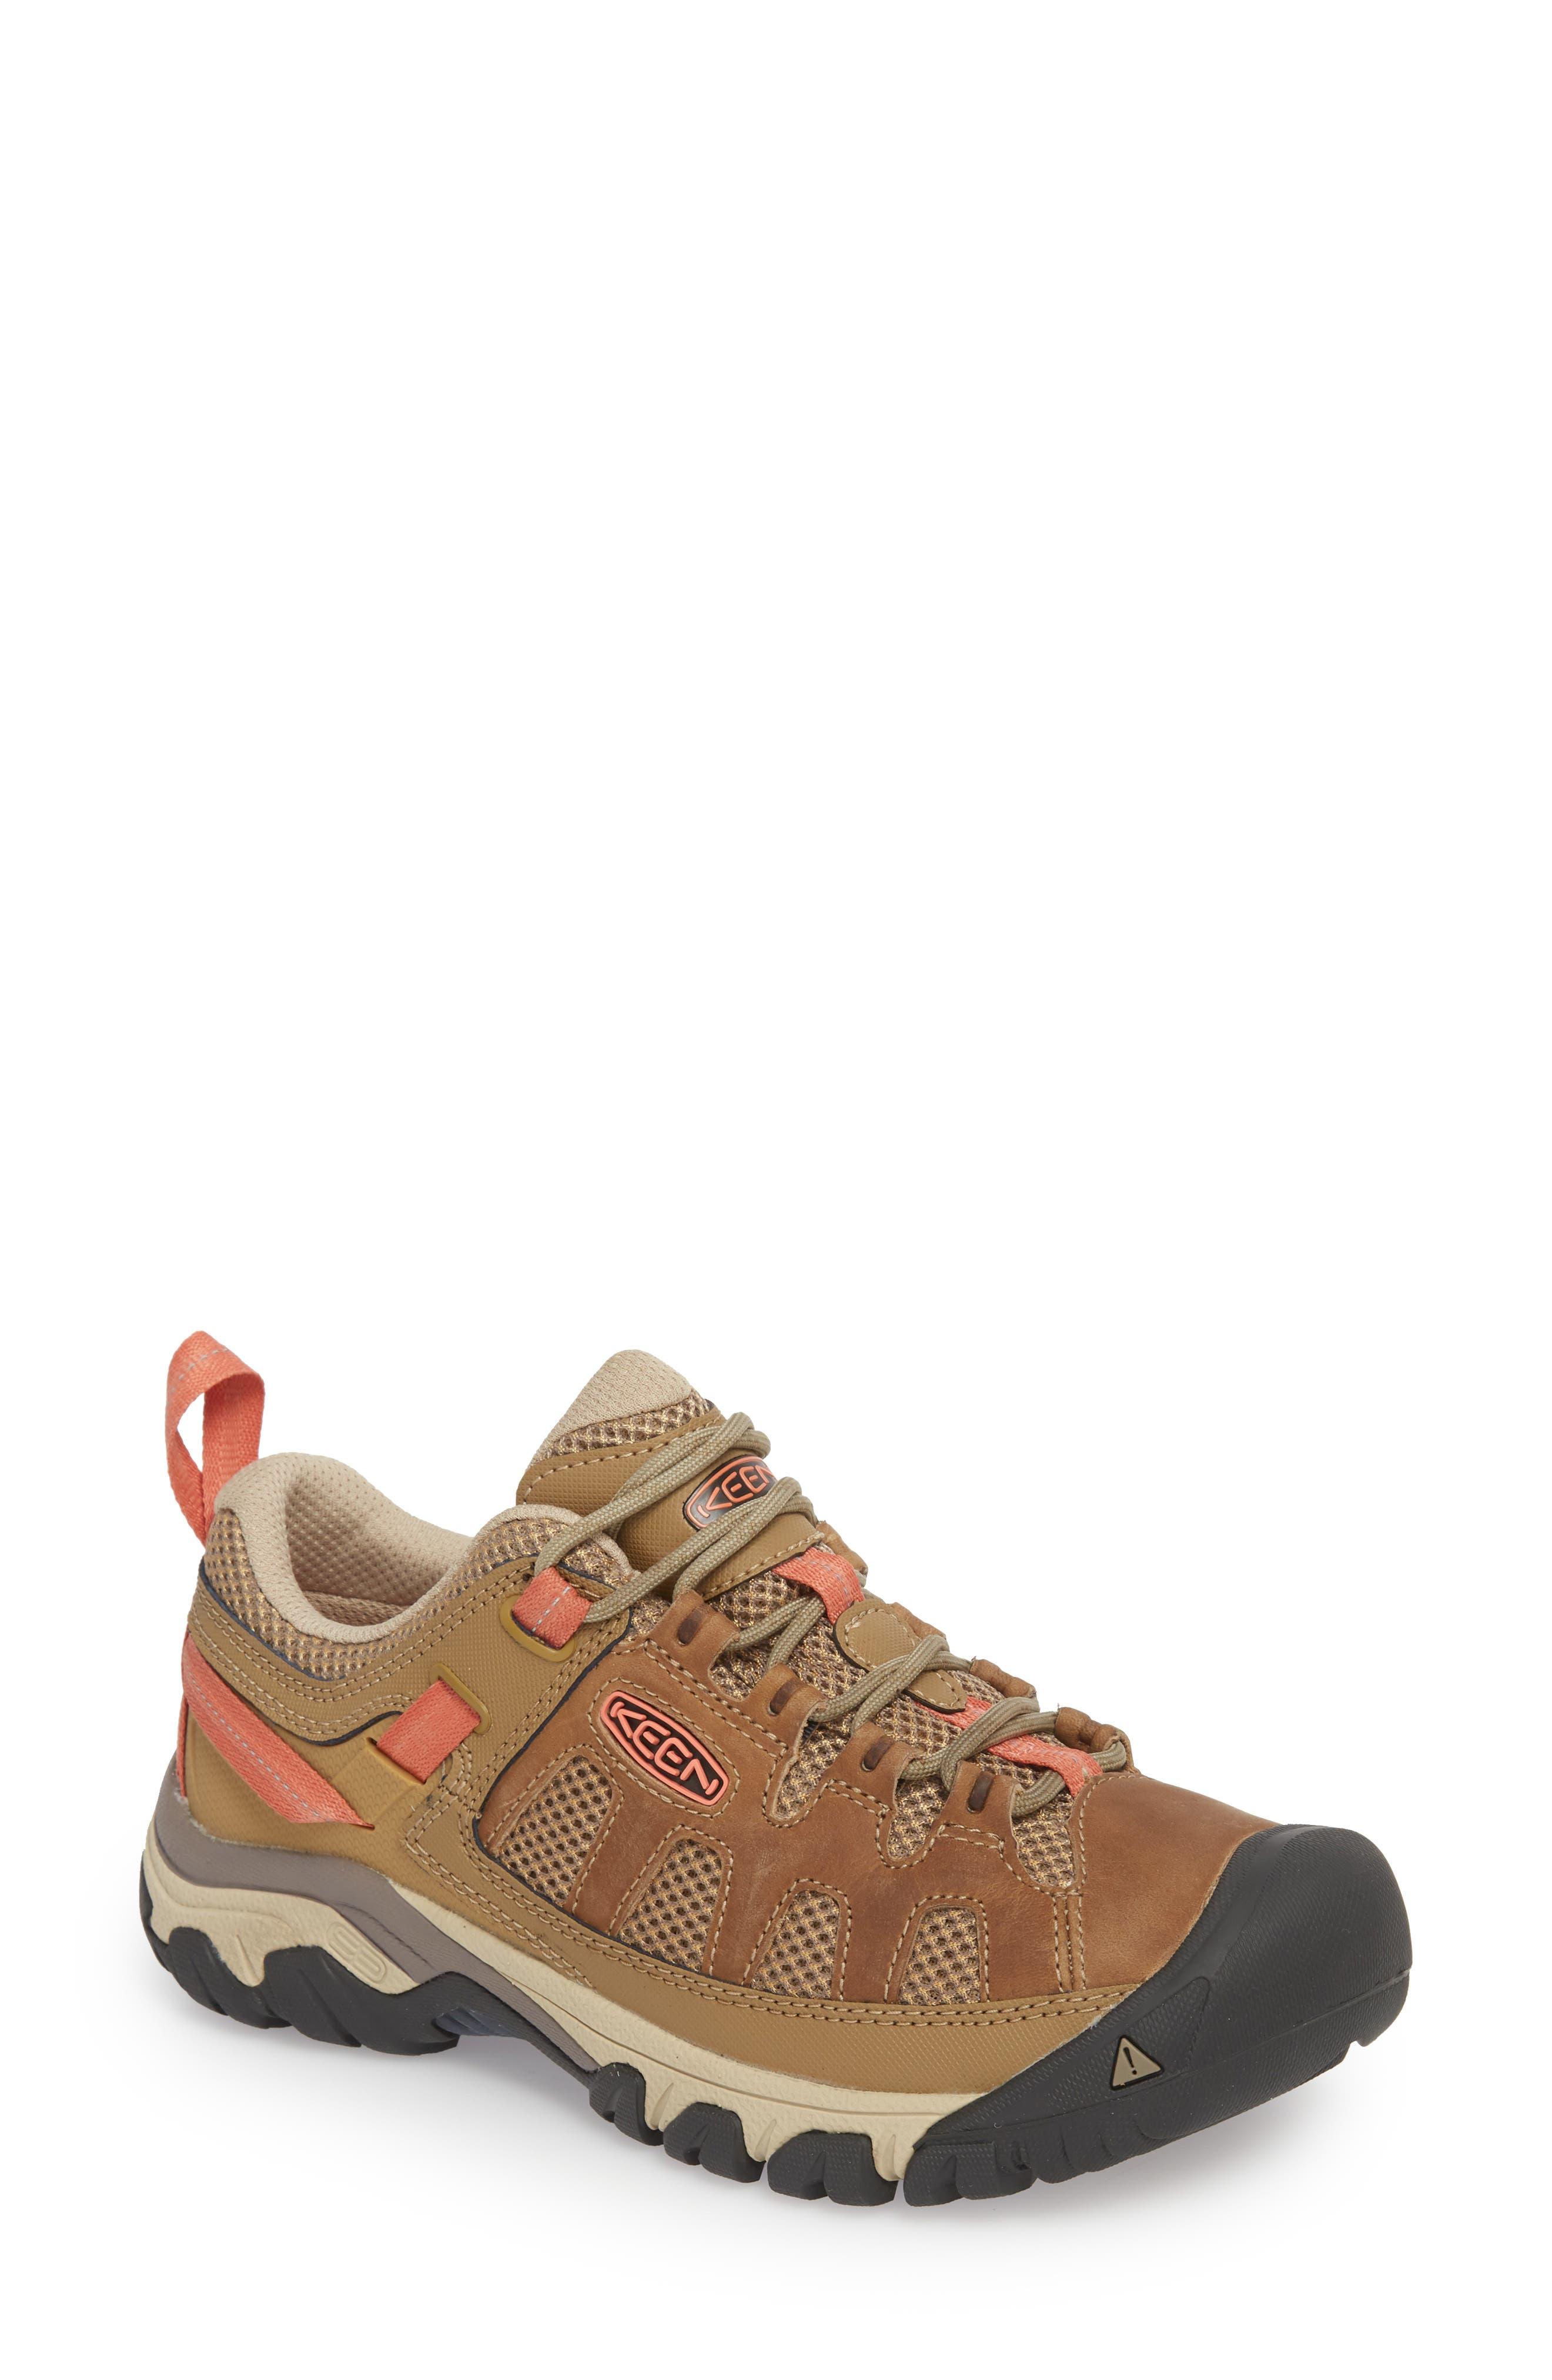 Targhee Vent Hiking Shoe,                         Main,                         color, Sandy/ Cornstalk Leather